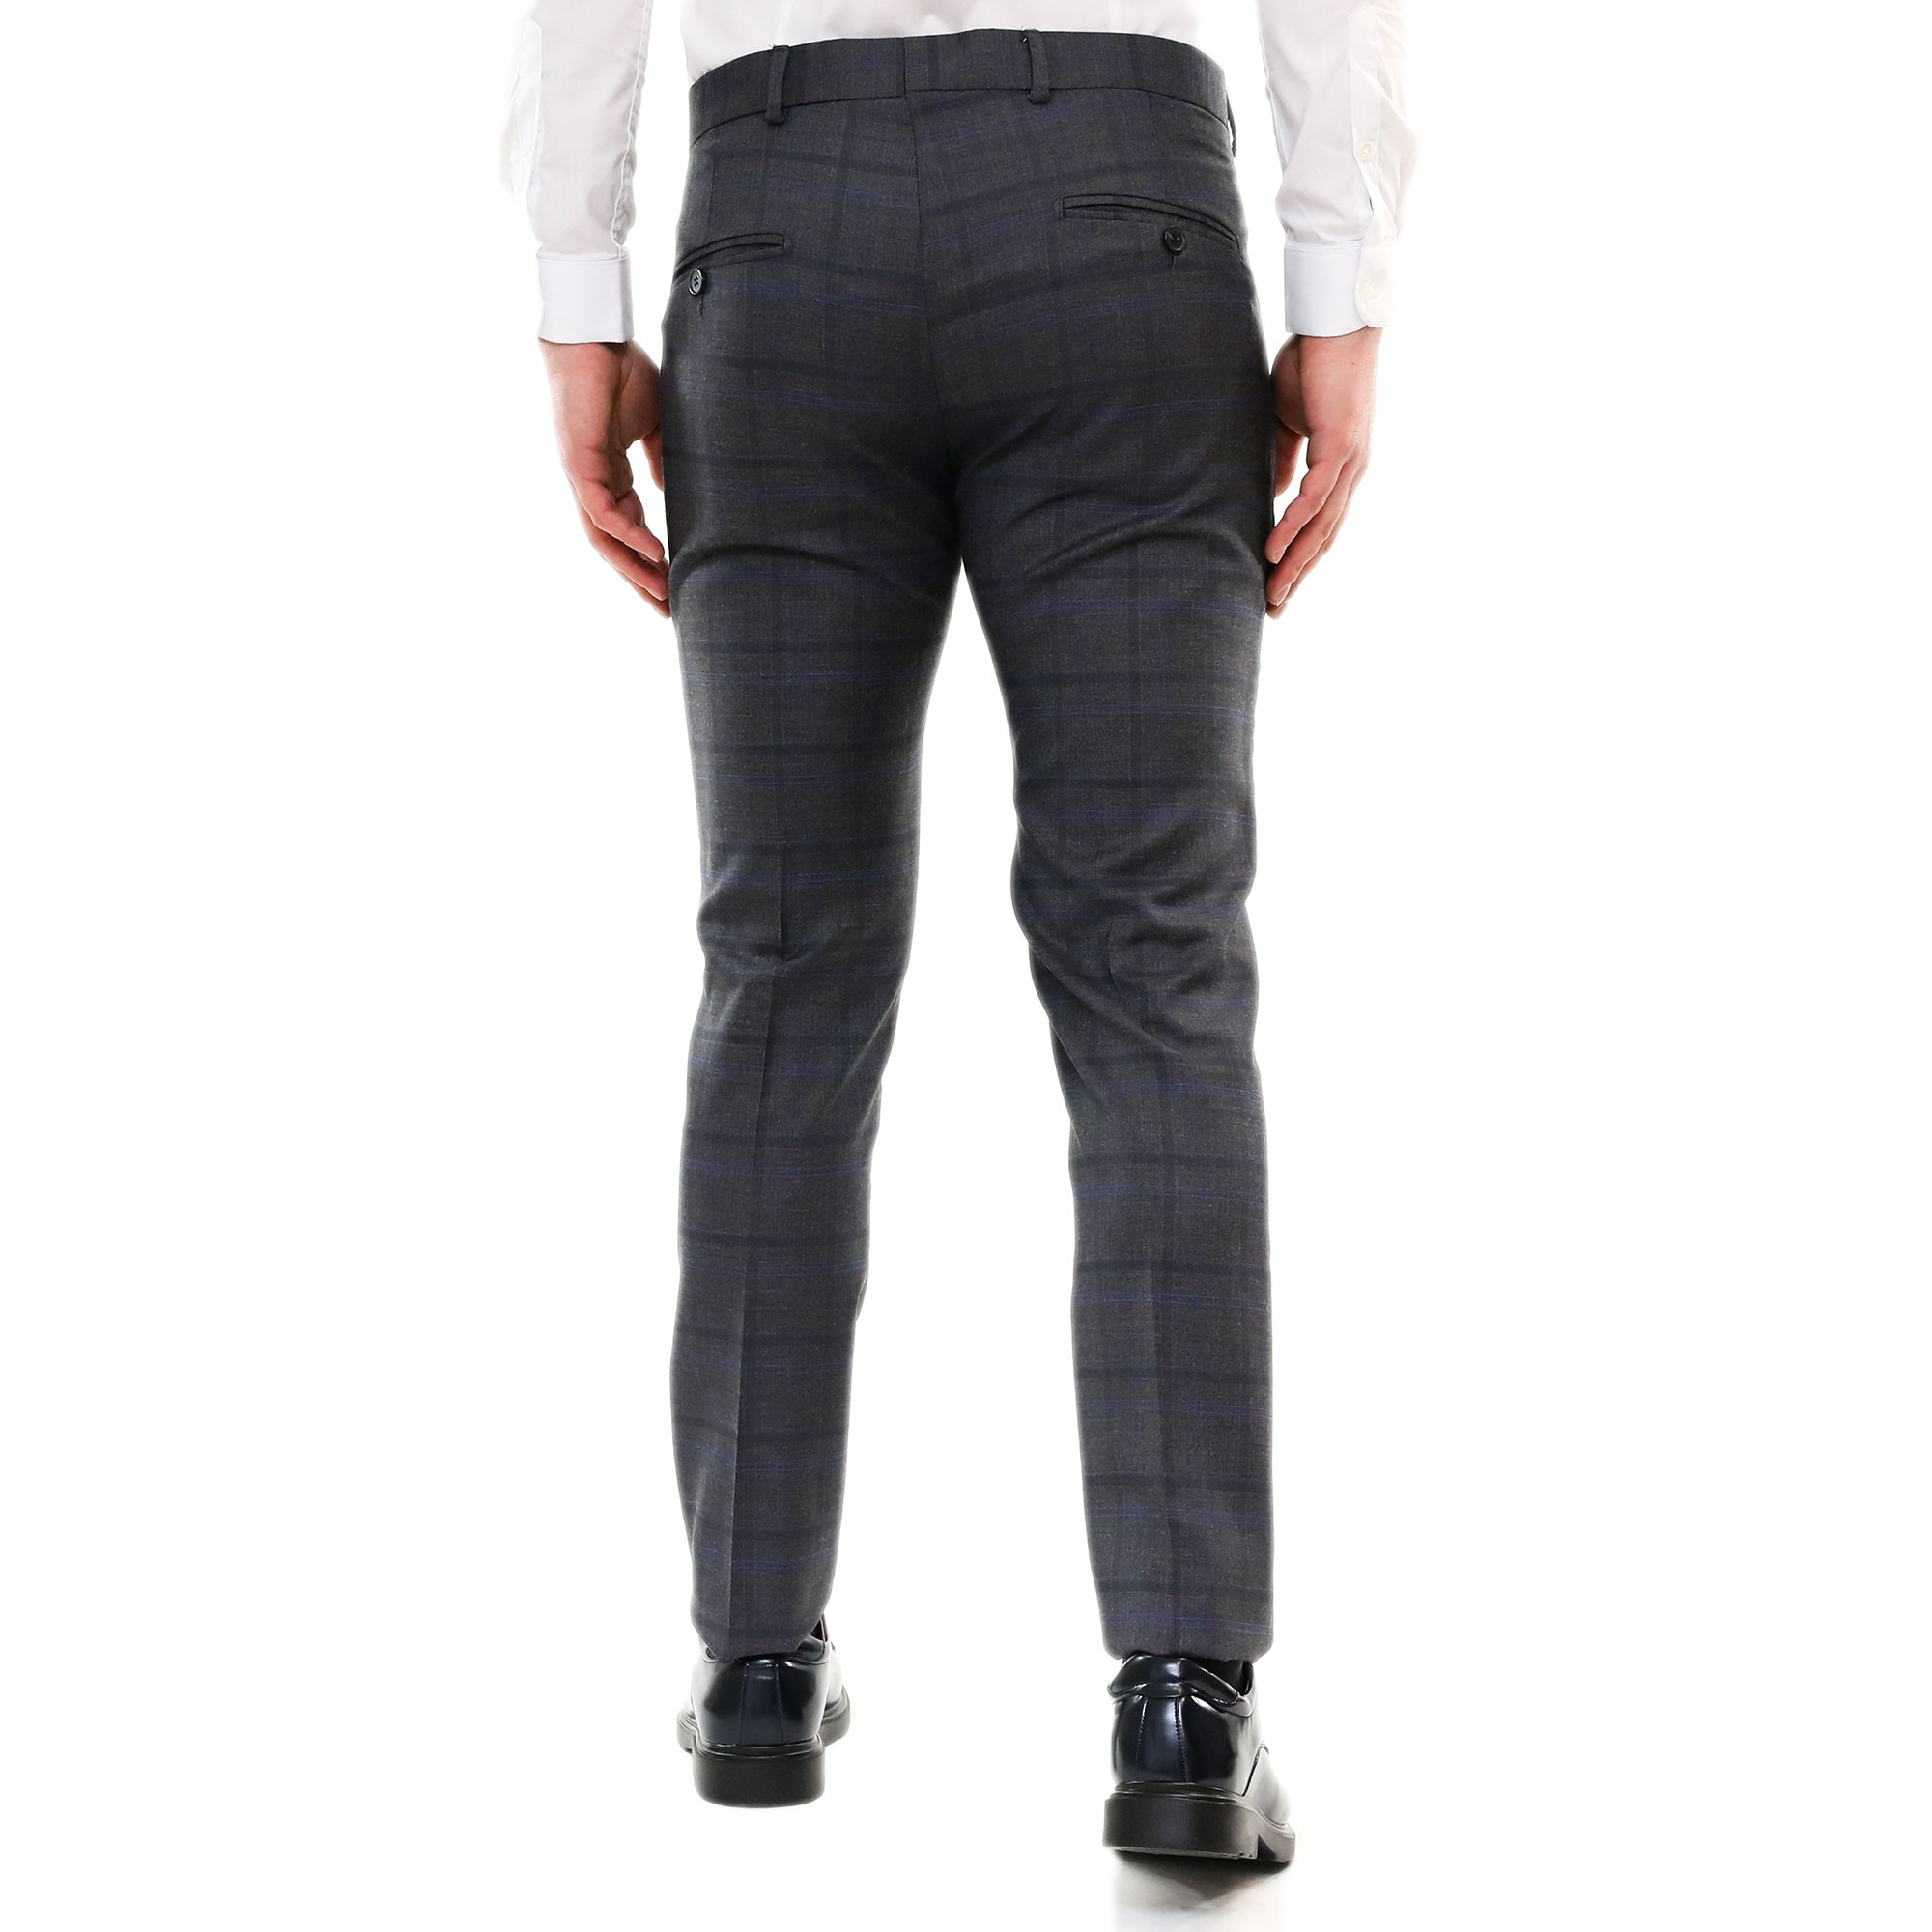 Pantaloni-Uomo-Chino-Cotone-Elegante-Estivi-Abito-Estivo-Tasca-America miniatura 7